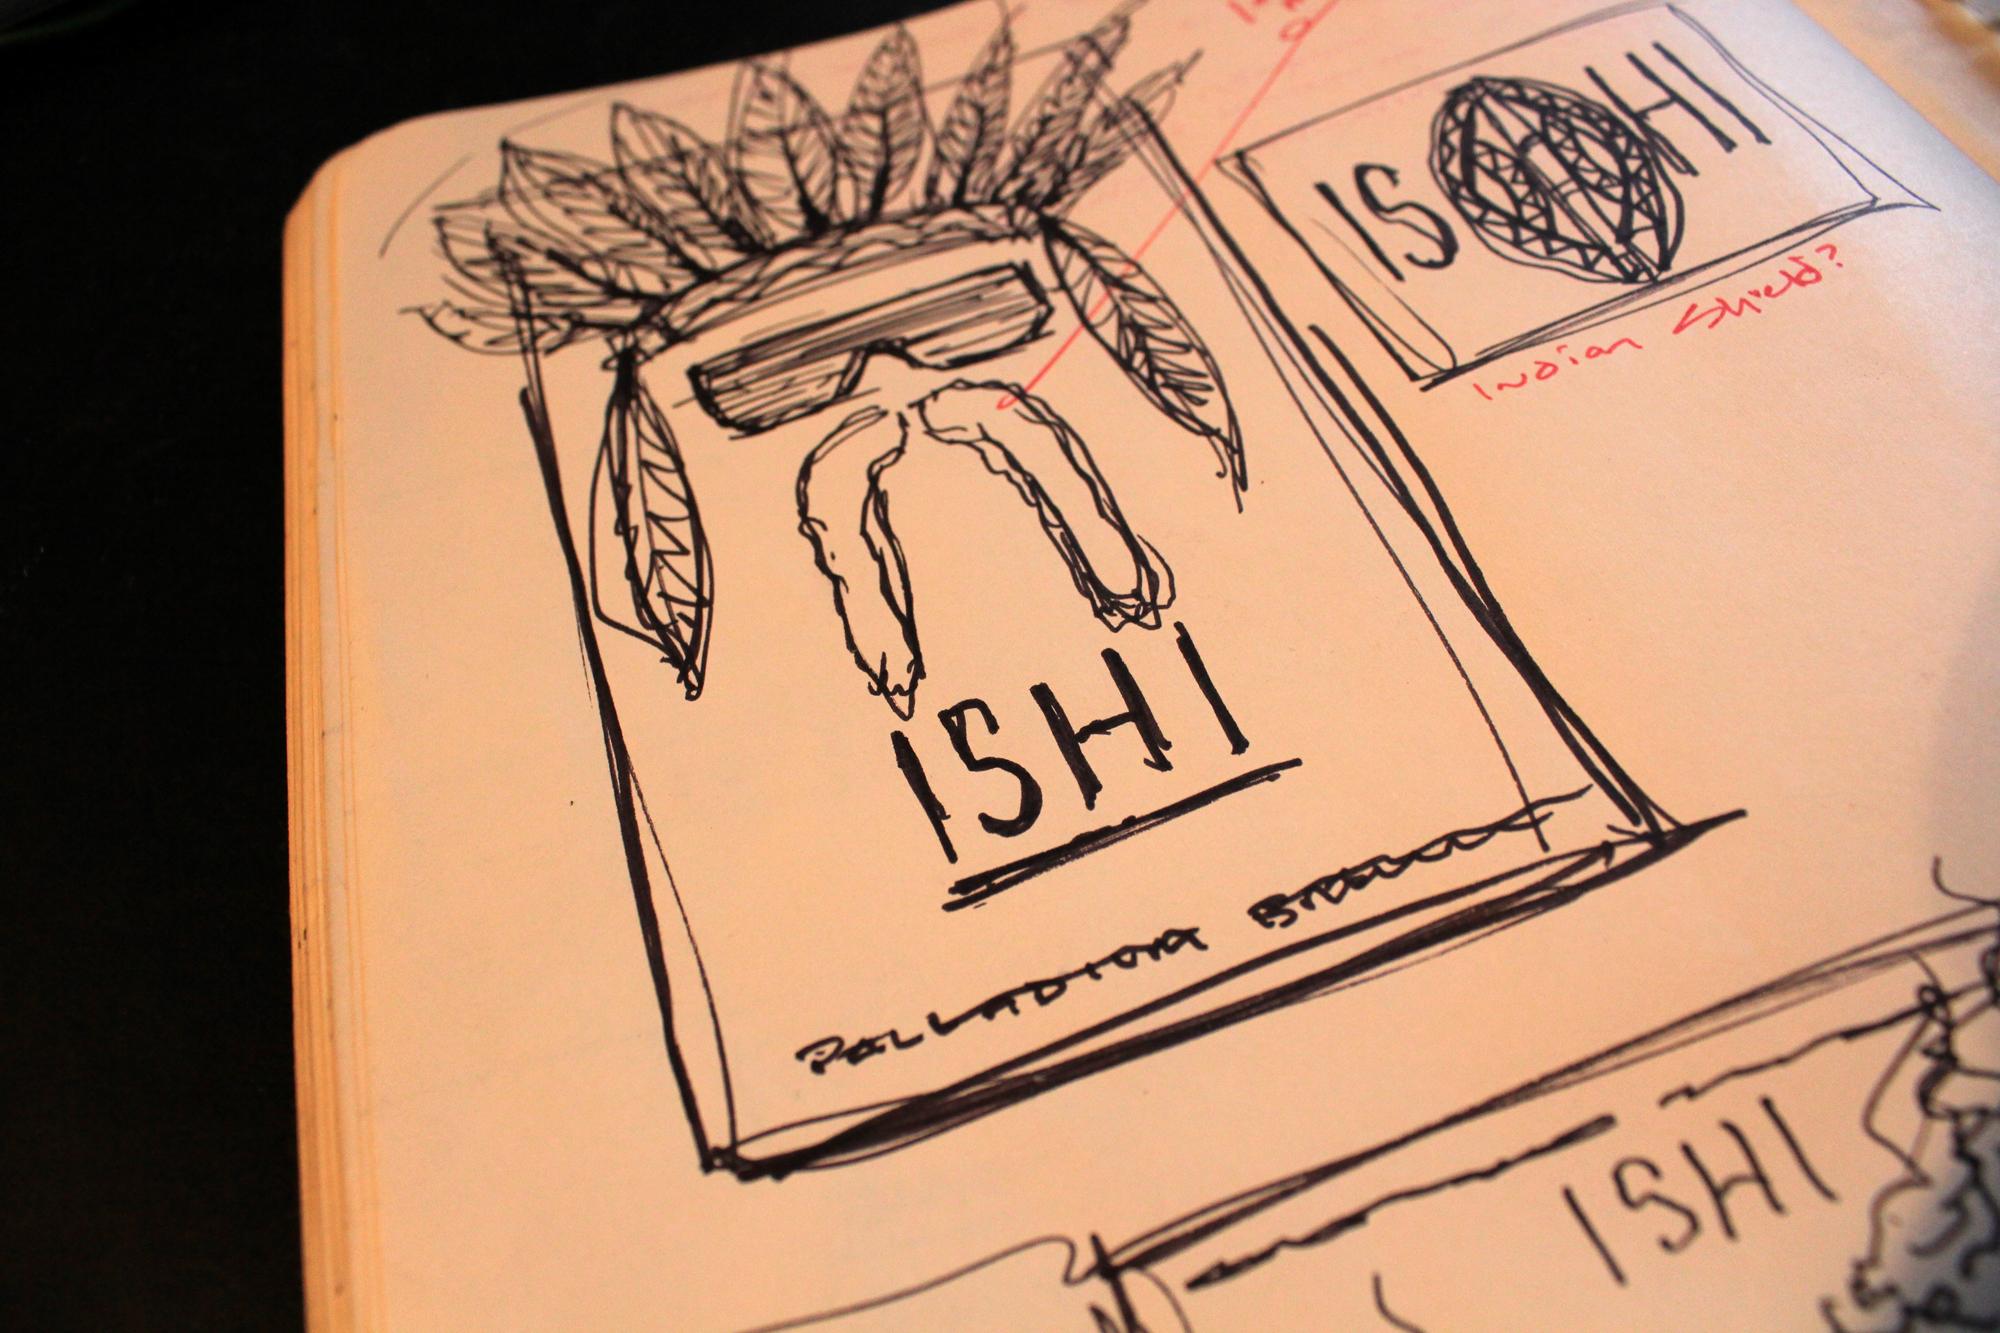 ISHI - image 5 - student project